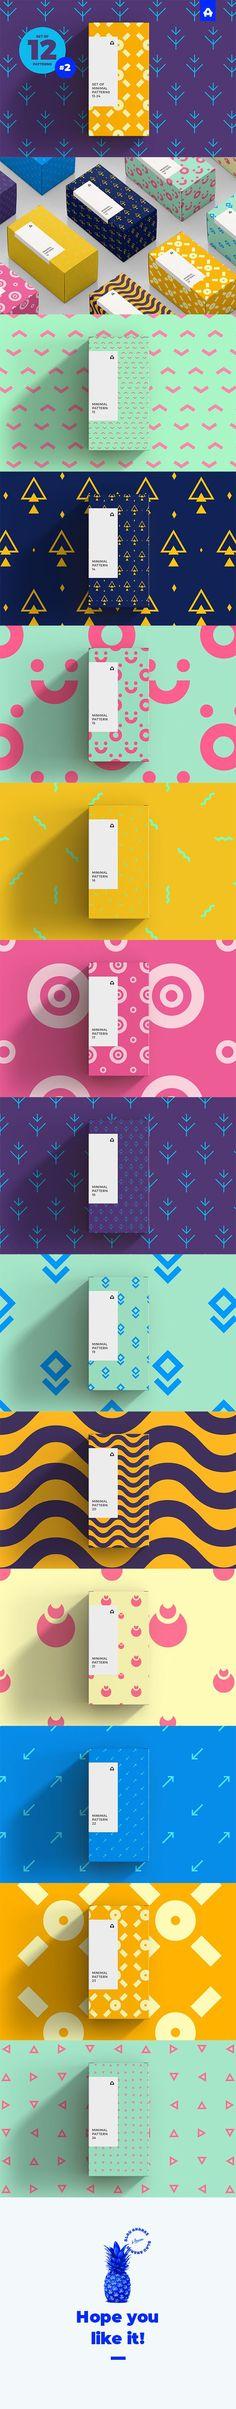 Set of Minimal Patterns vol 2 #funny #background